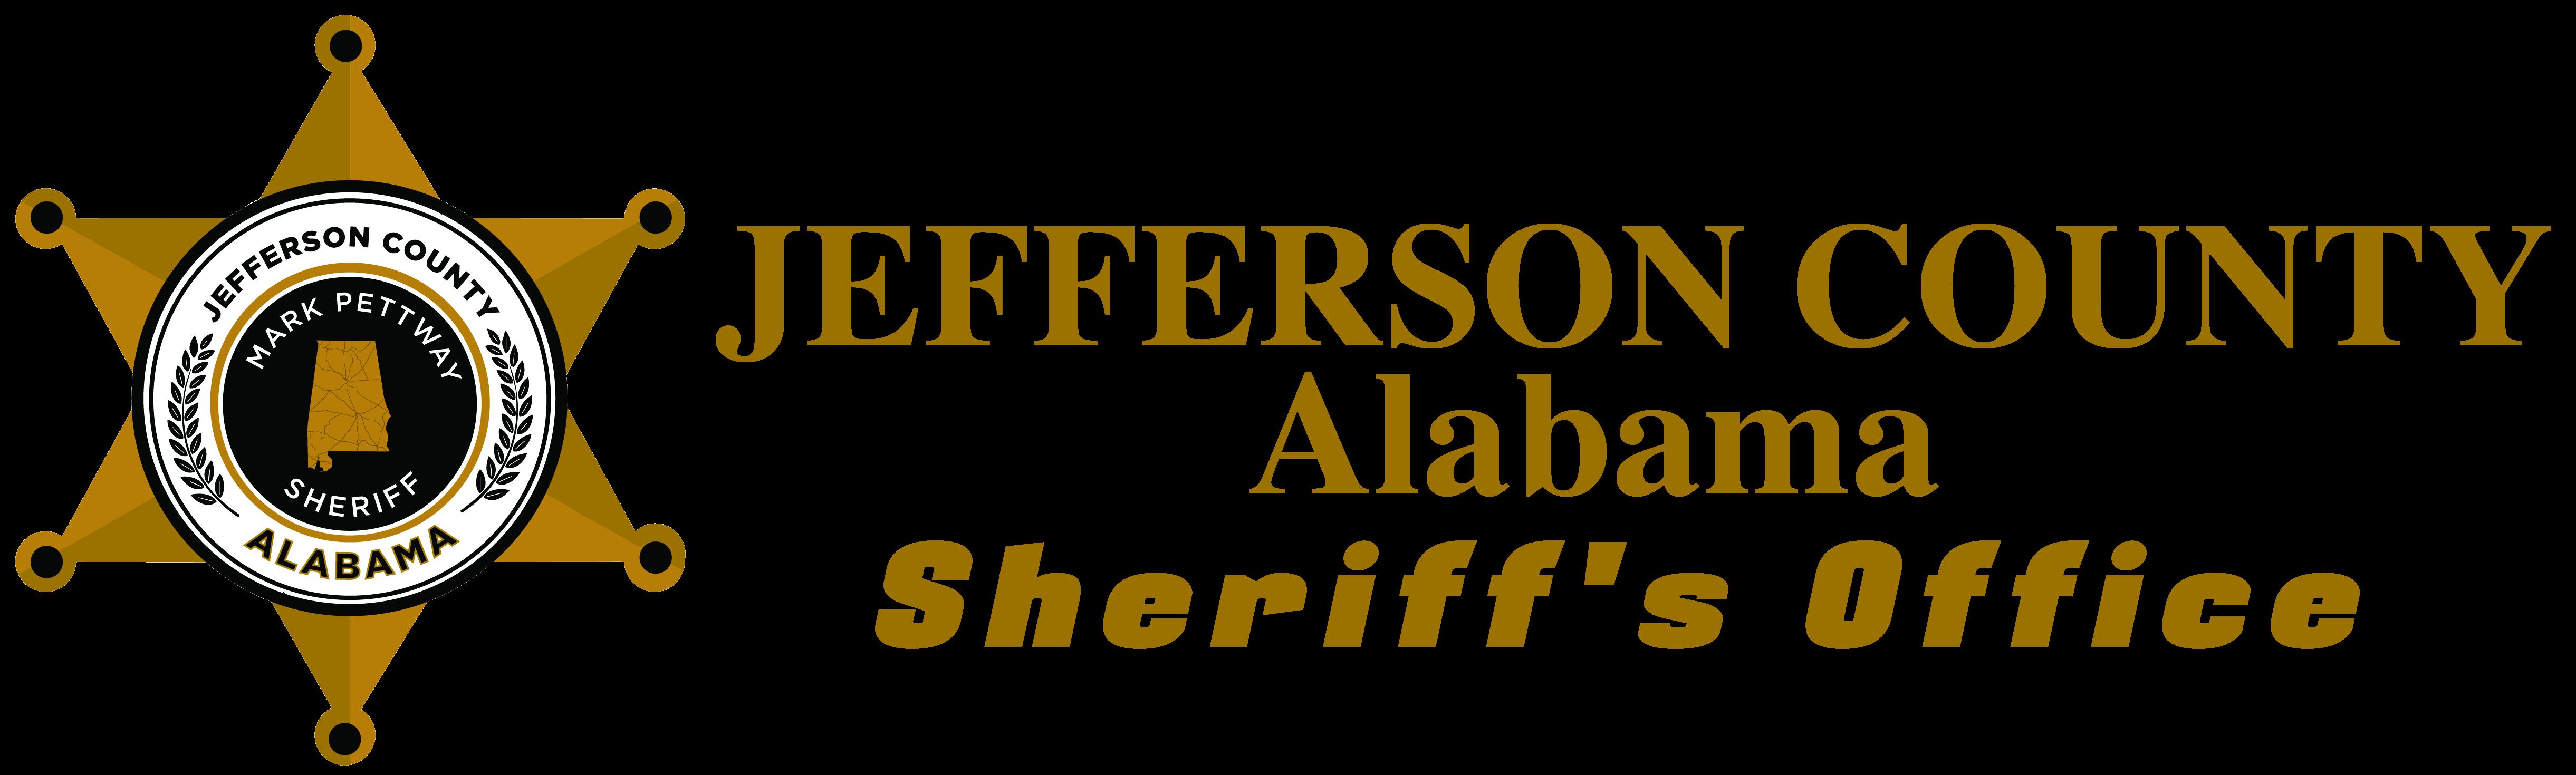 Jefferson-County-Sheriff-Logo-01trans1cropb_Alabama2